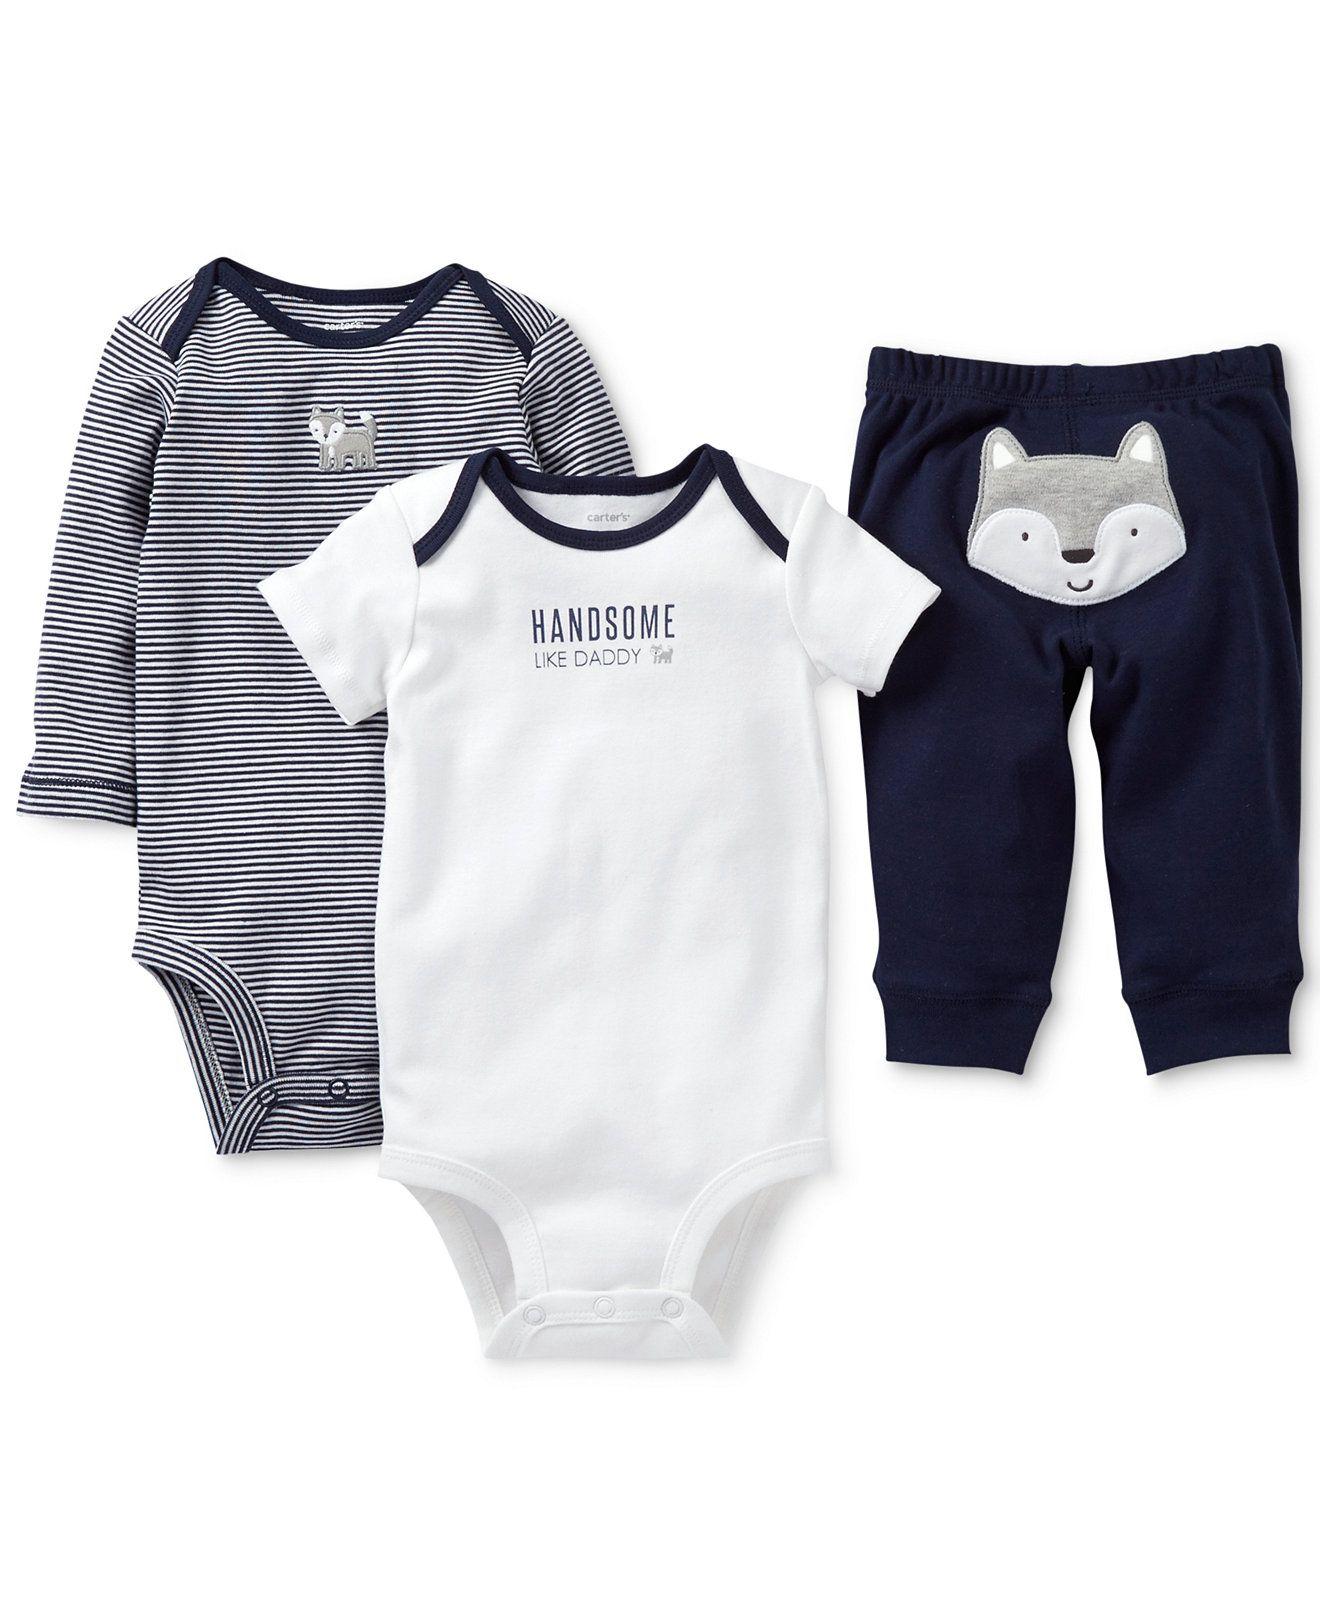 d664cfe83 Carter's Baby Boys' 3-Piece Wolf Bodysuits & Pants Set - Kids Baby Boy  (0-24 months) - Macy's